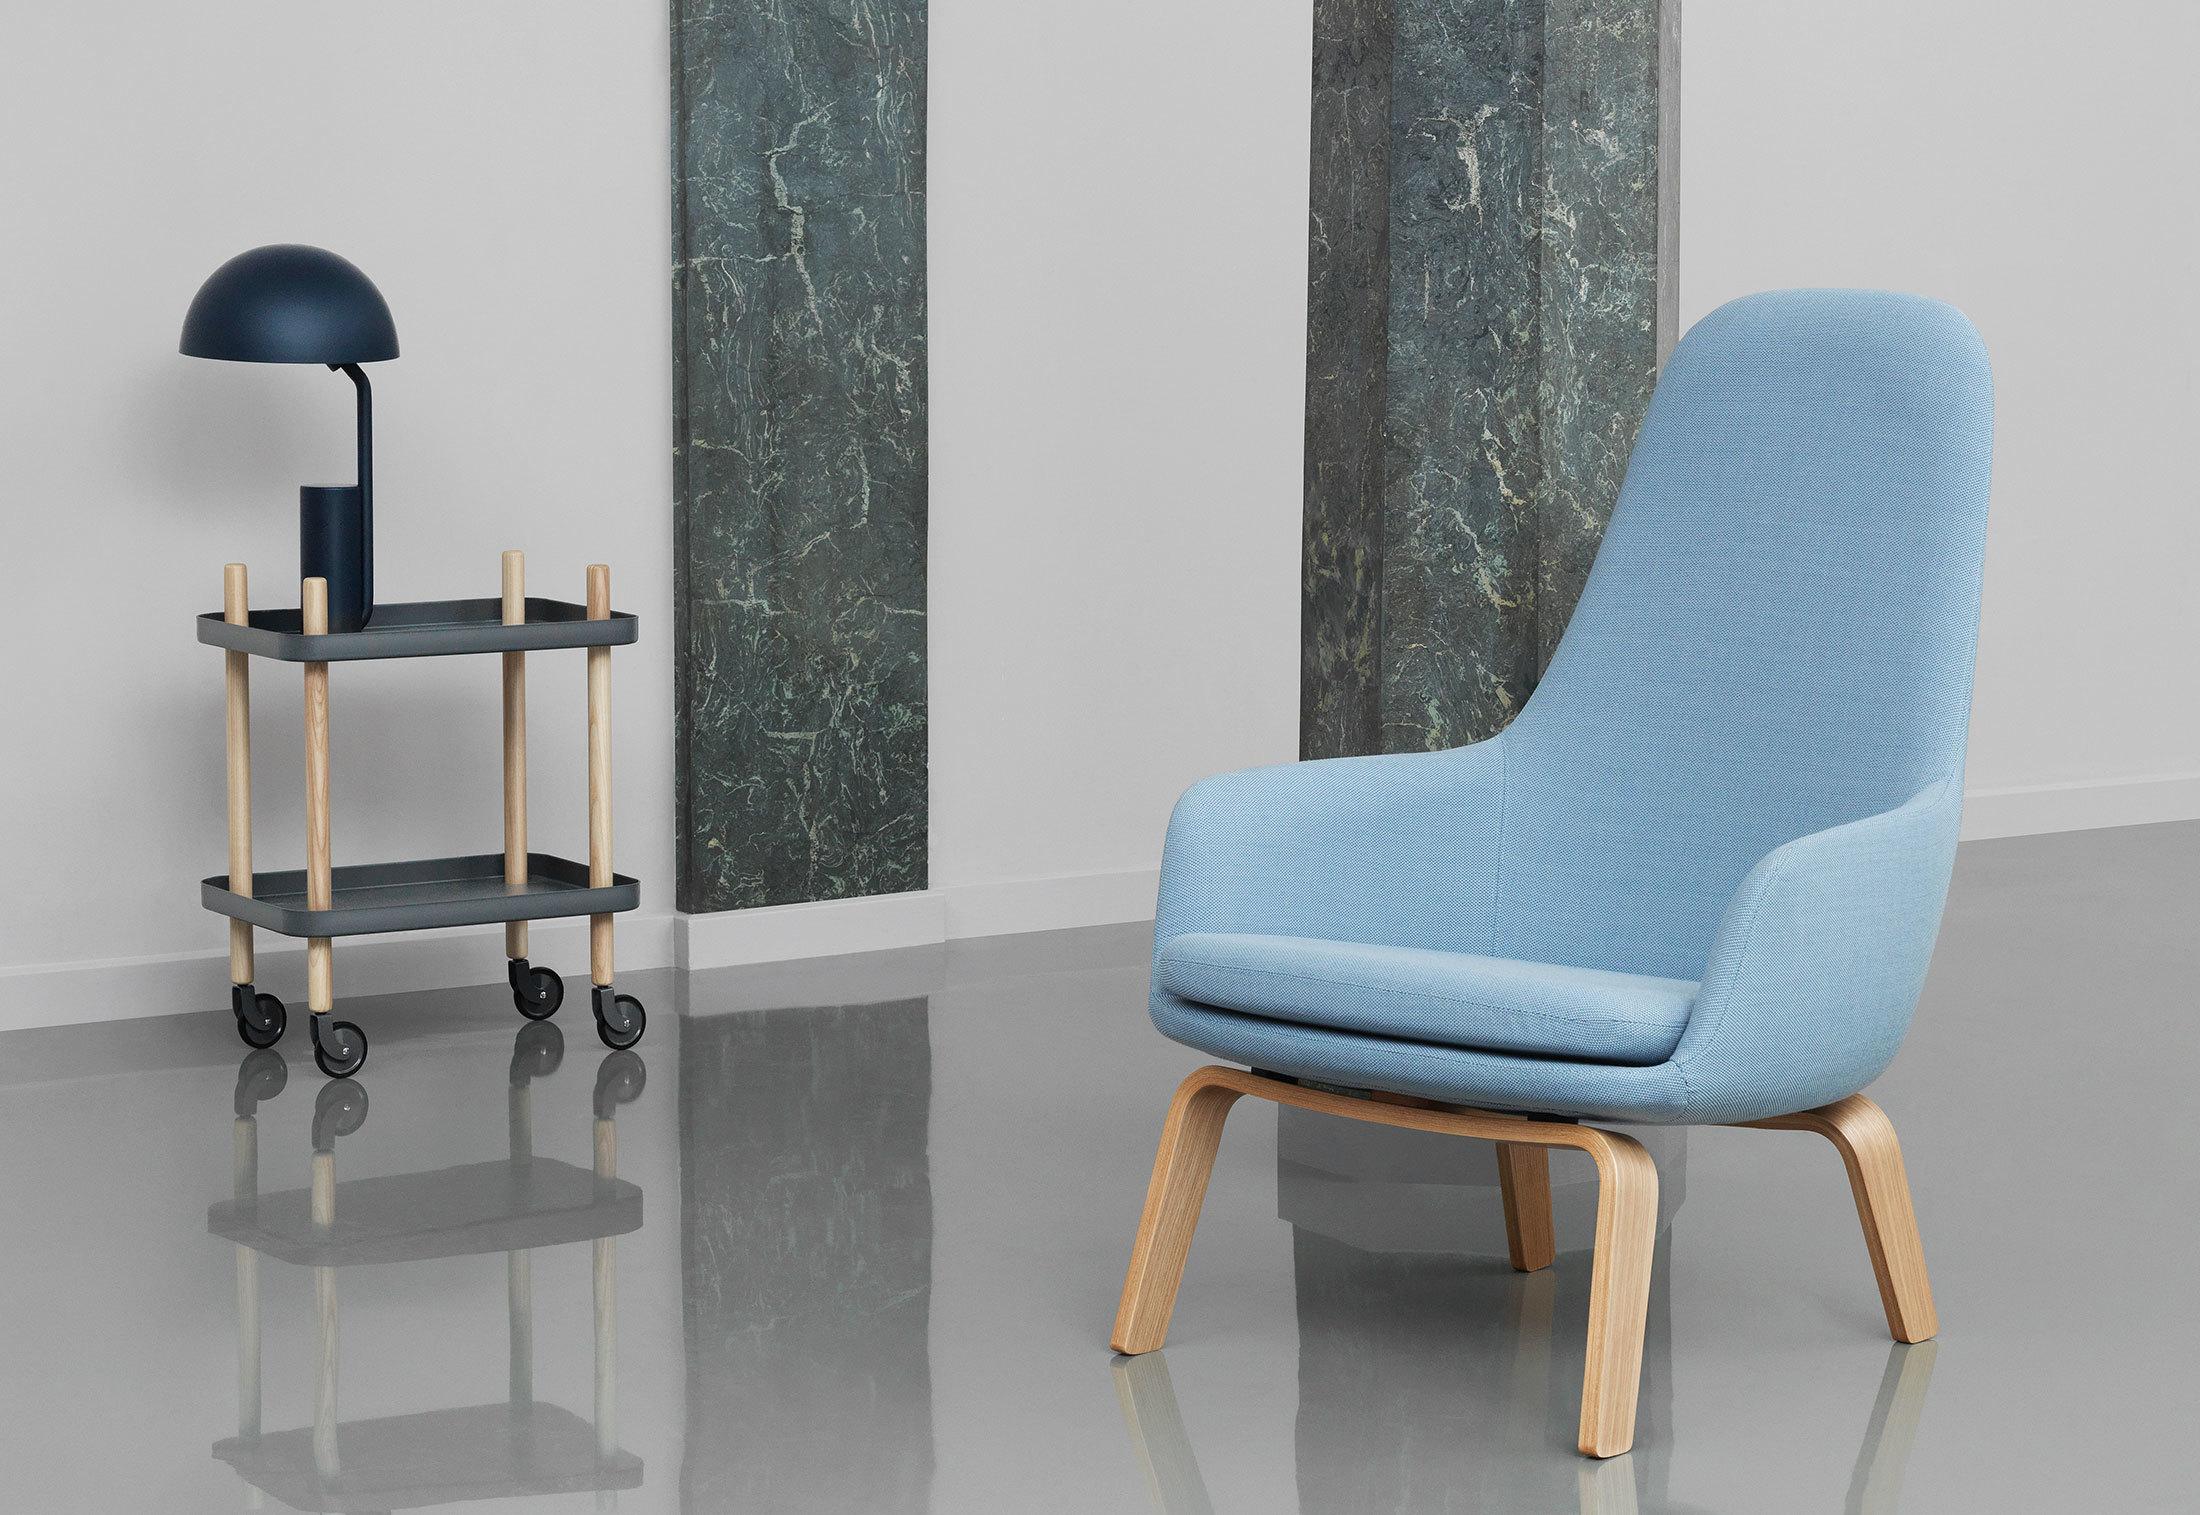 Peachy Era Swivel Lounge Chair By Normann Copenhagen Stylepark Creativecarmelina Interior Chair Design Creativecarmelinacom